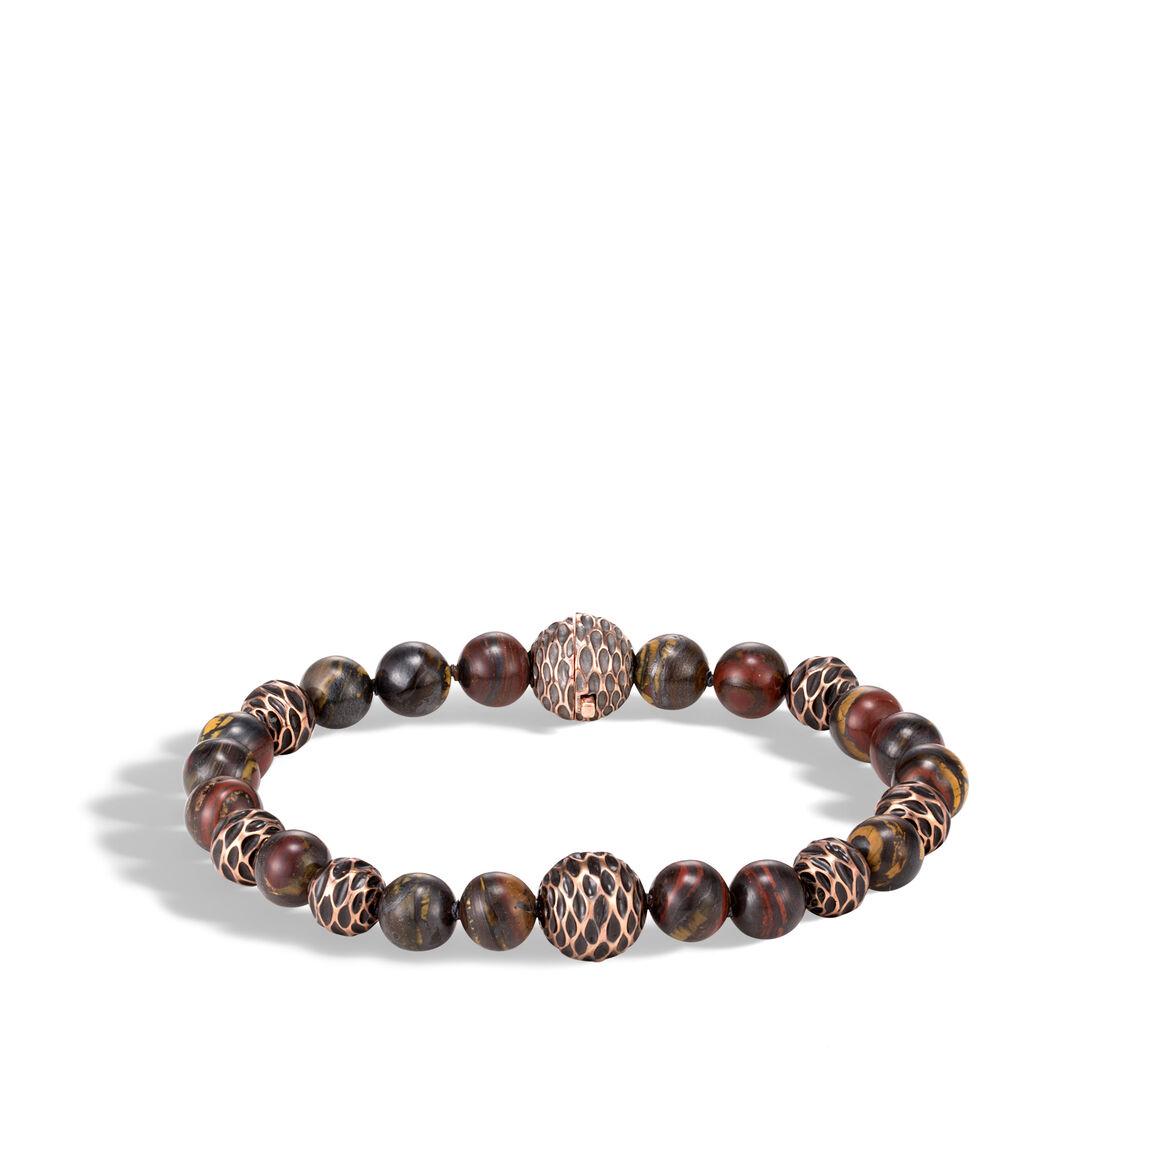 Legends Naga Bead Bracelet in Bronze with Gemstone